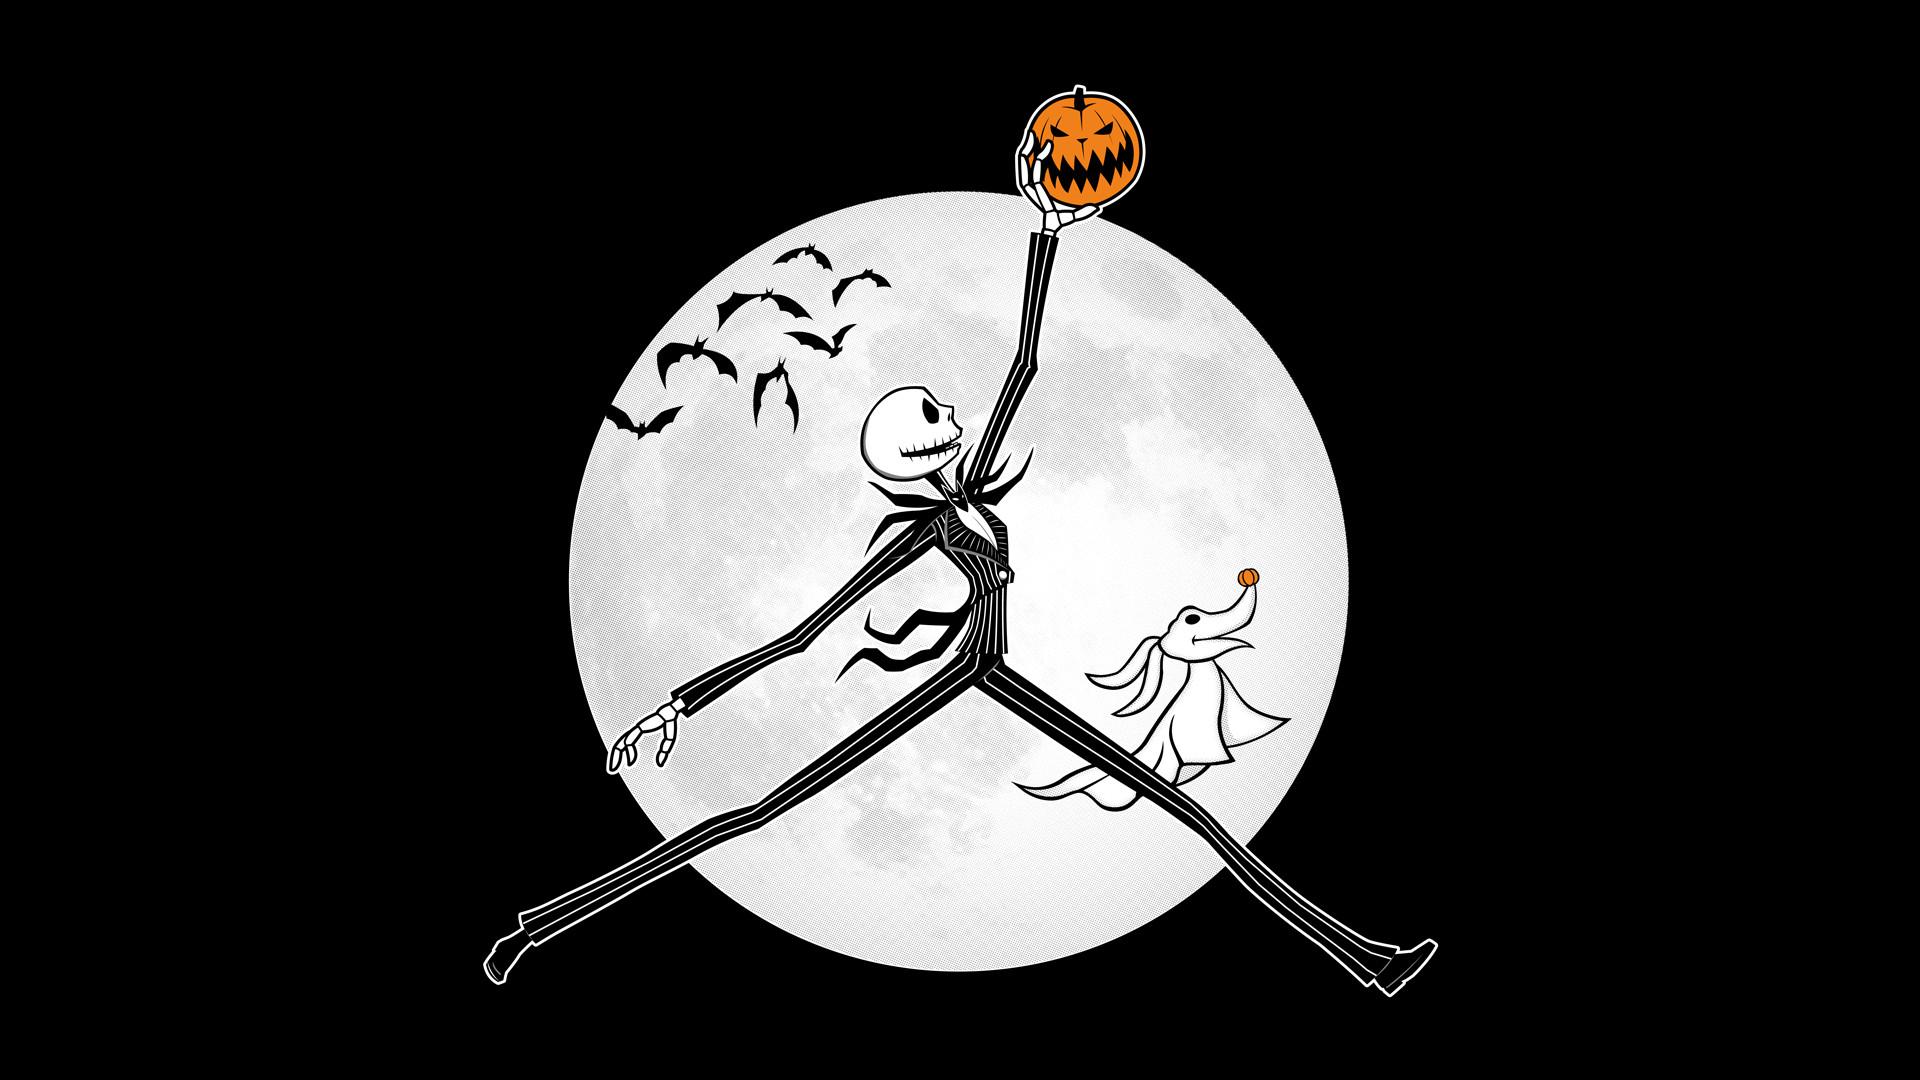 Jack the Pumpkin King Wallpaper (75+ images)